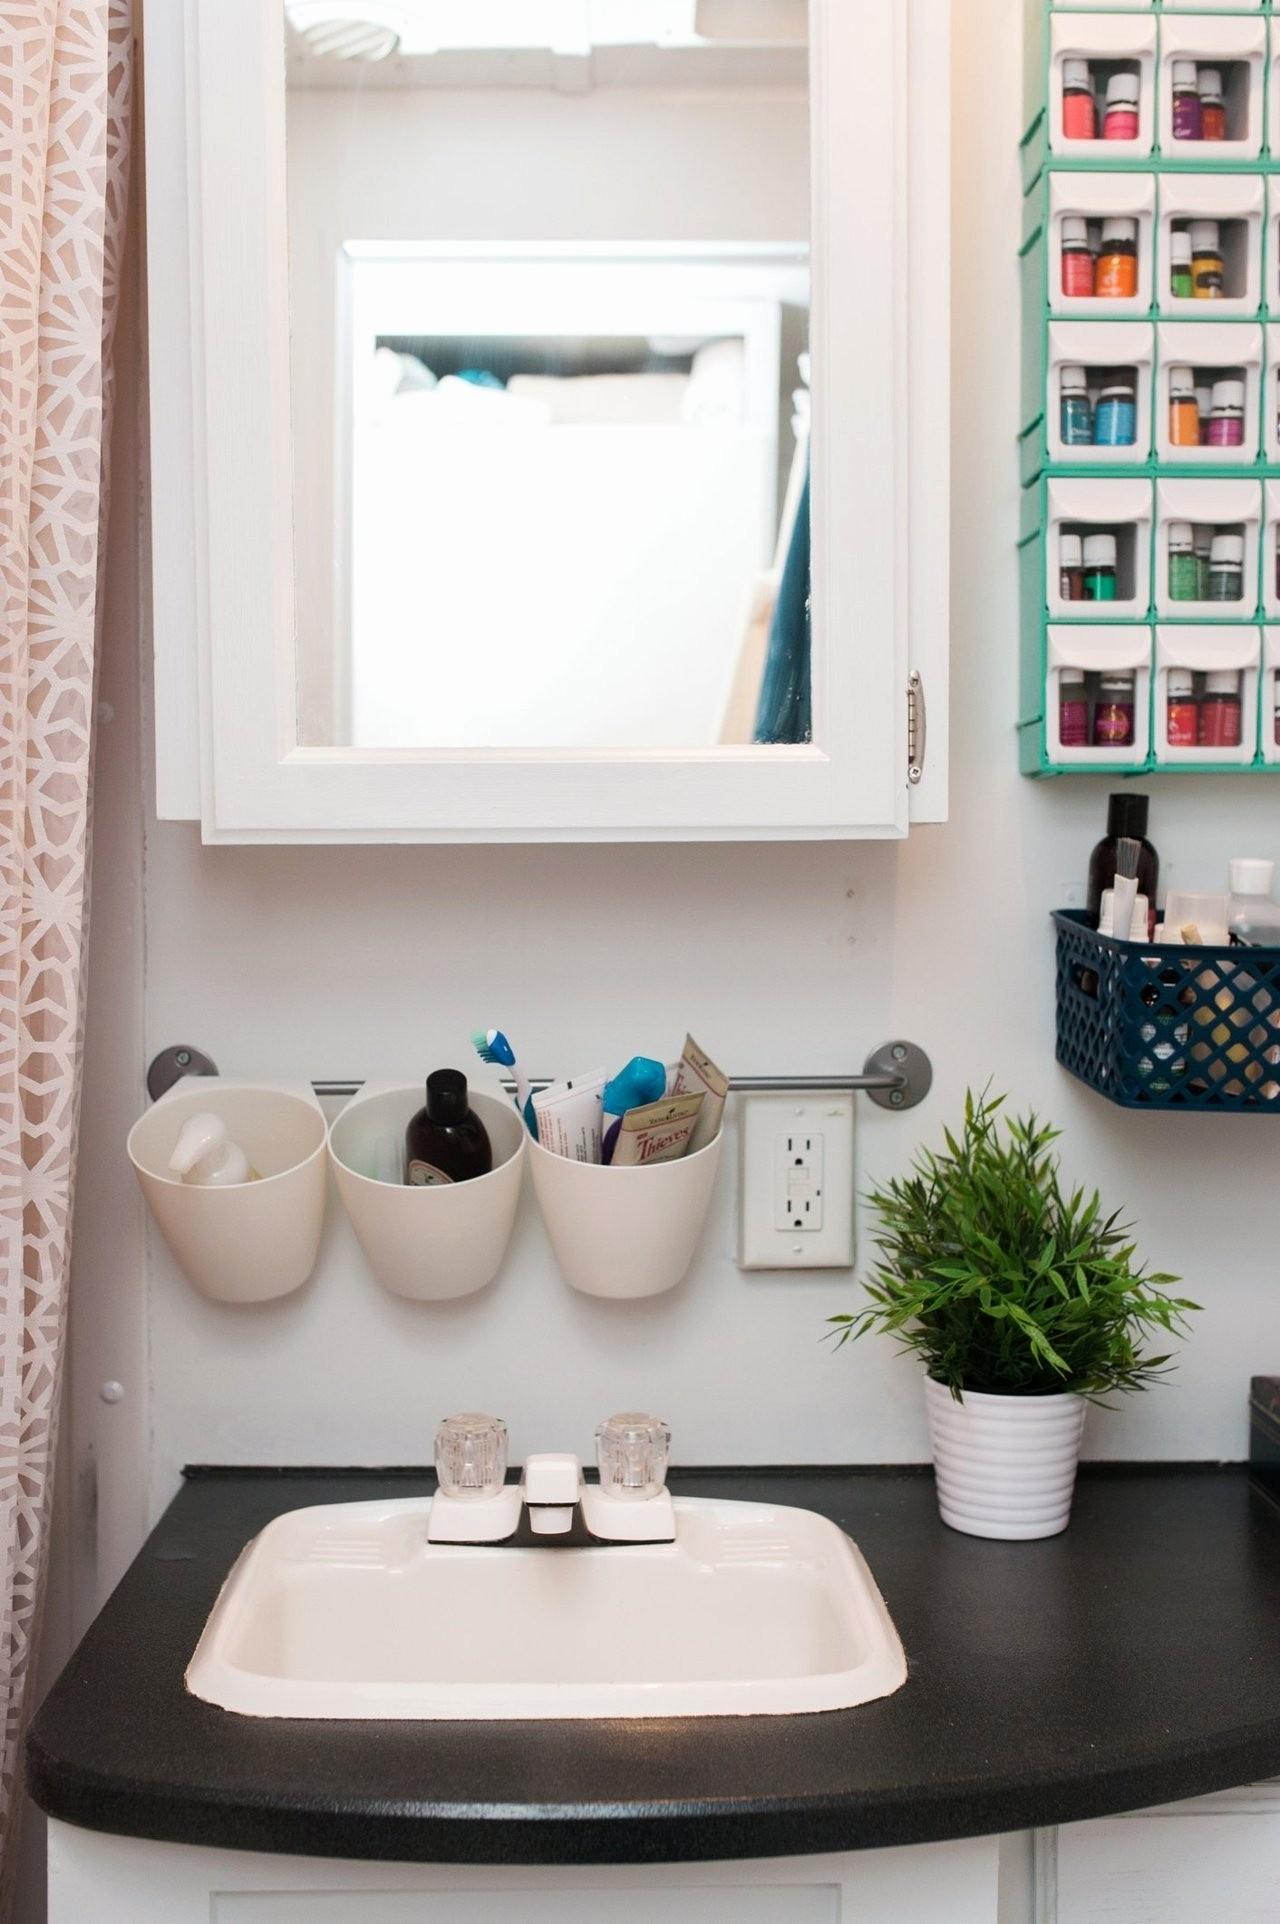 Beautiful Dominus Bathroom Accessories Frieze - Home Design Ideas ...